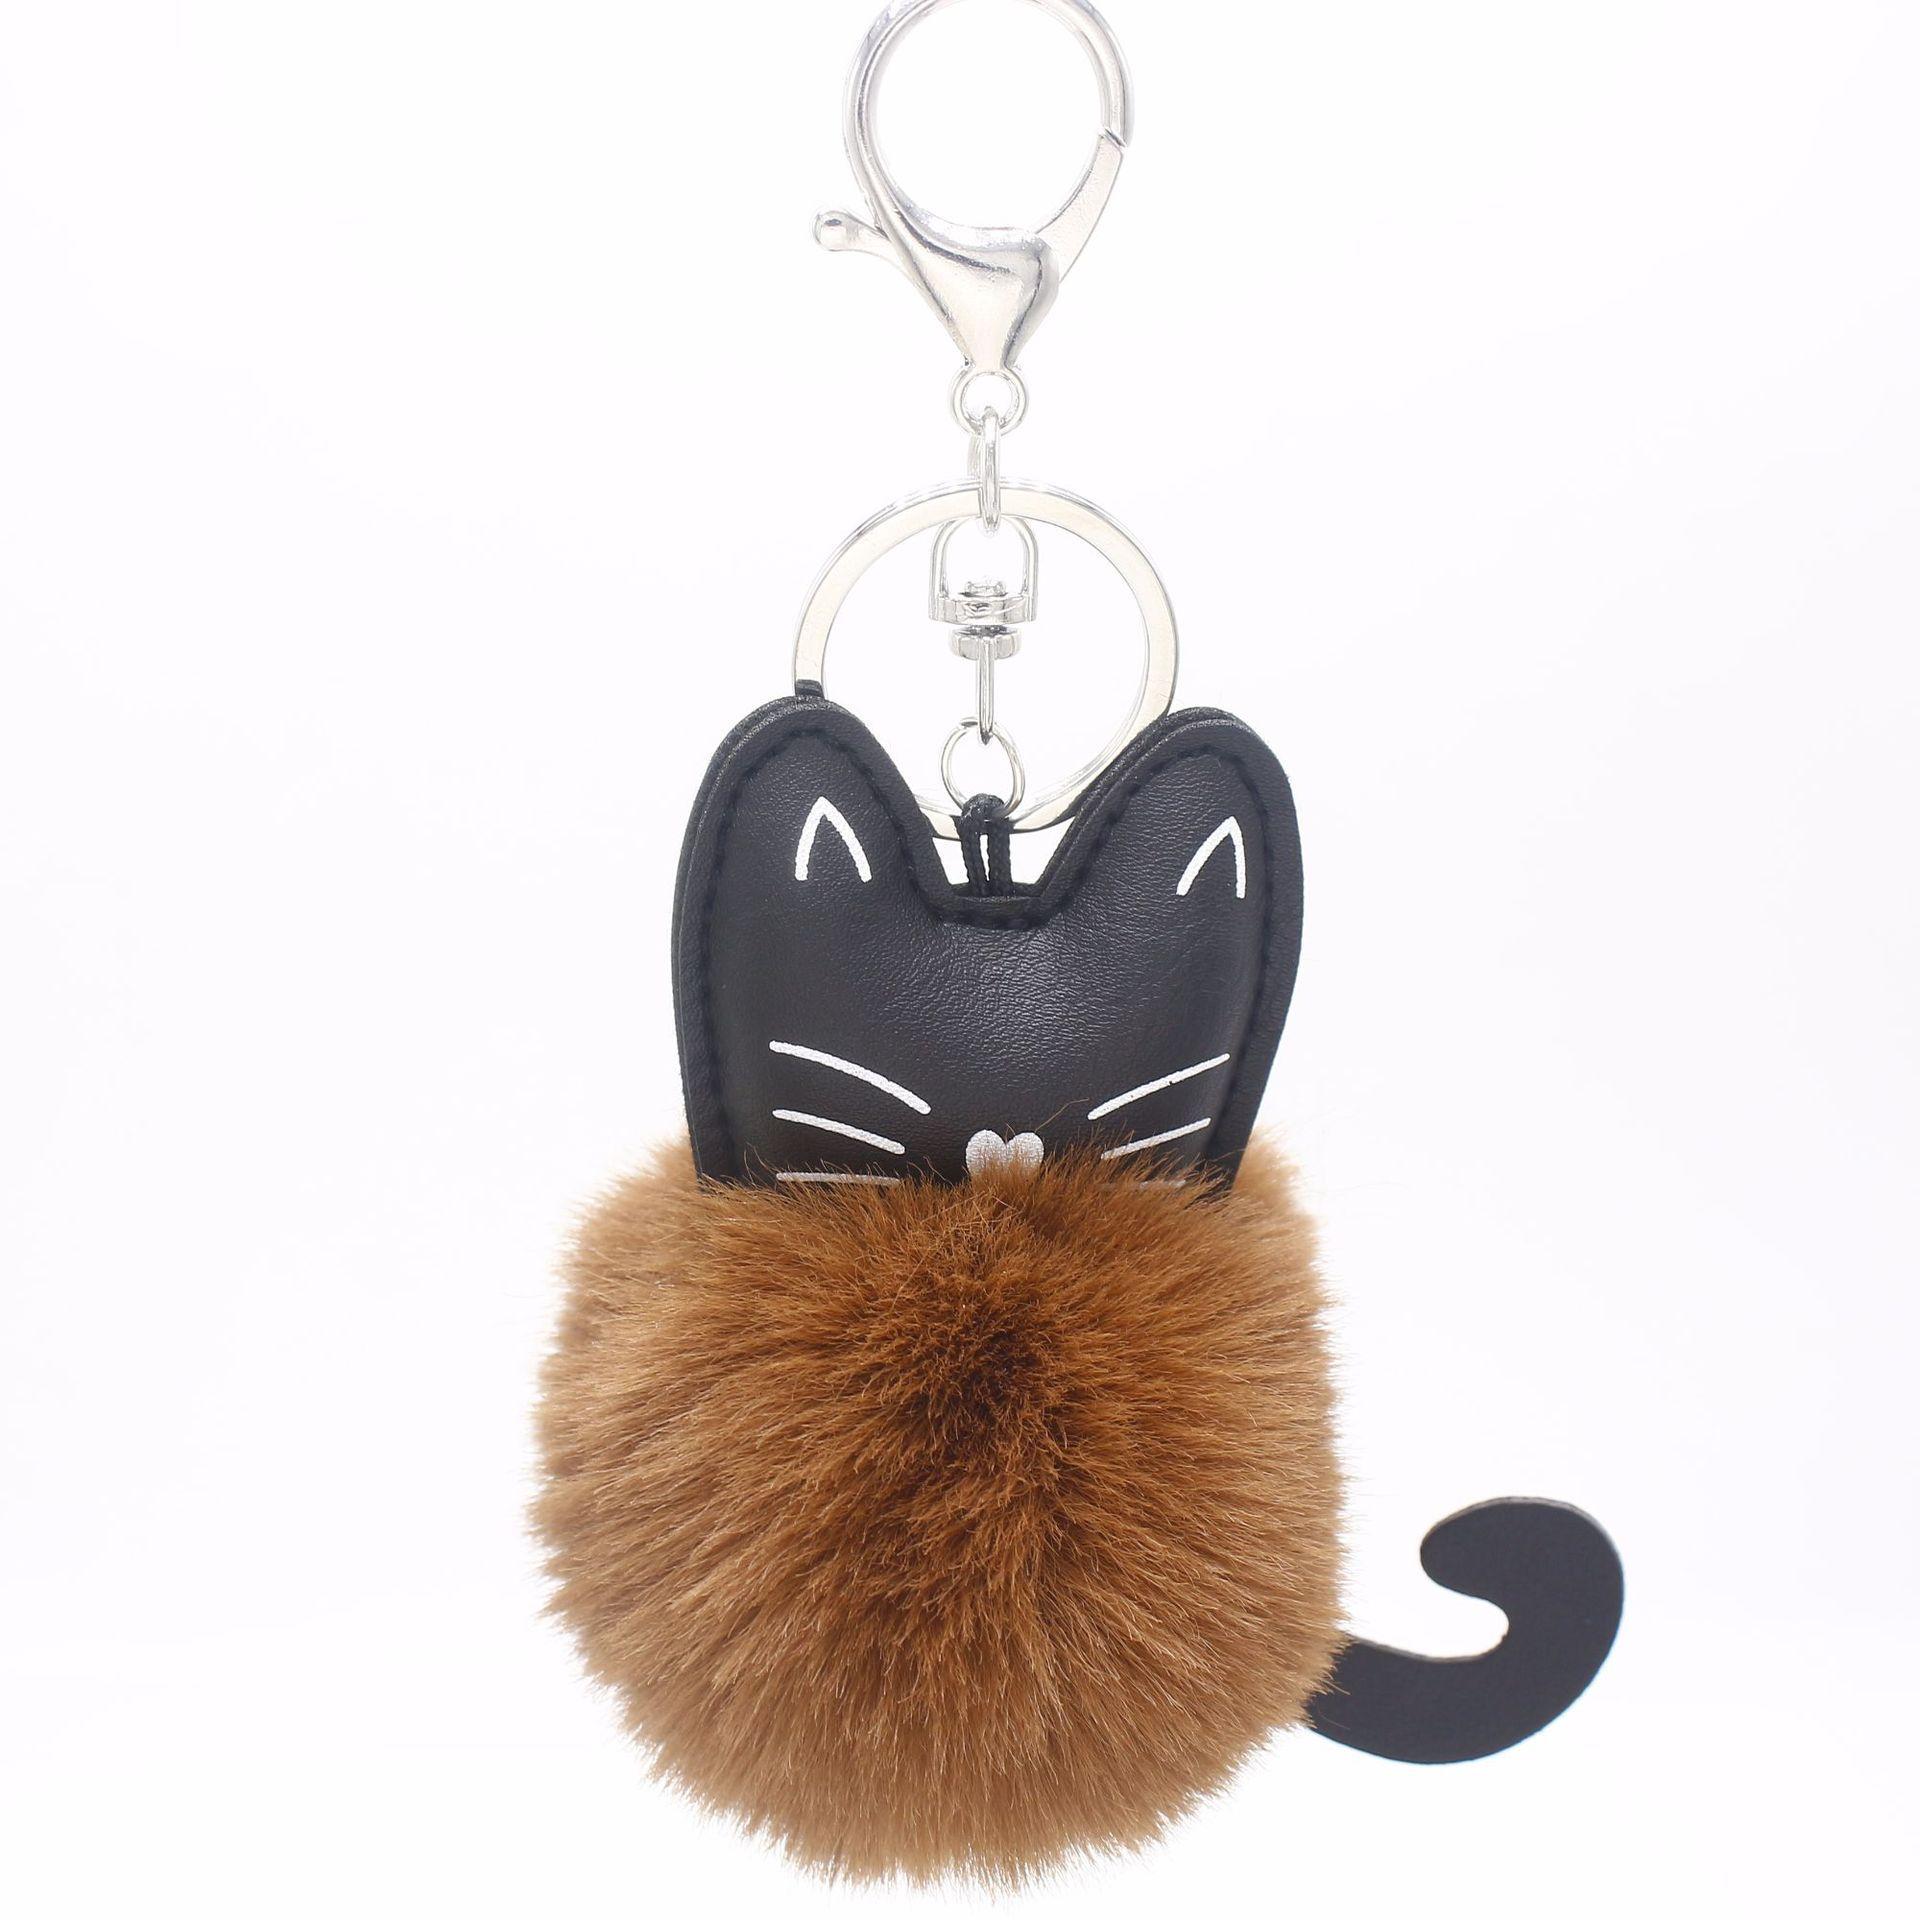 7color Personality Pure Color Plush Ball Fashion Mini Soft Stuffed Cat Plush Keychain Bag Xmas Pendants Ornaments Toy